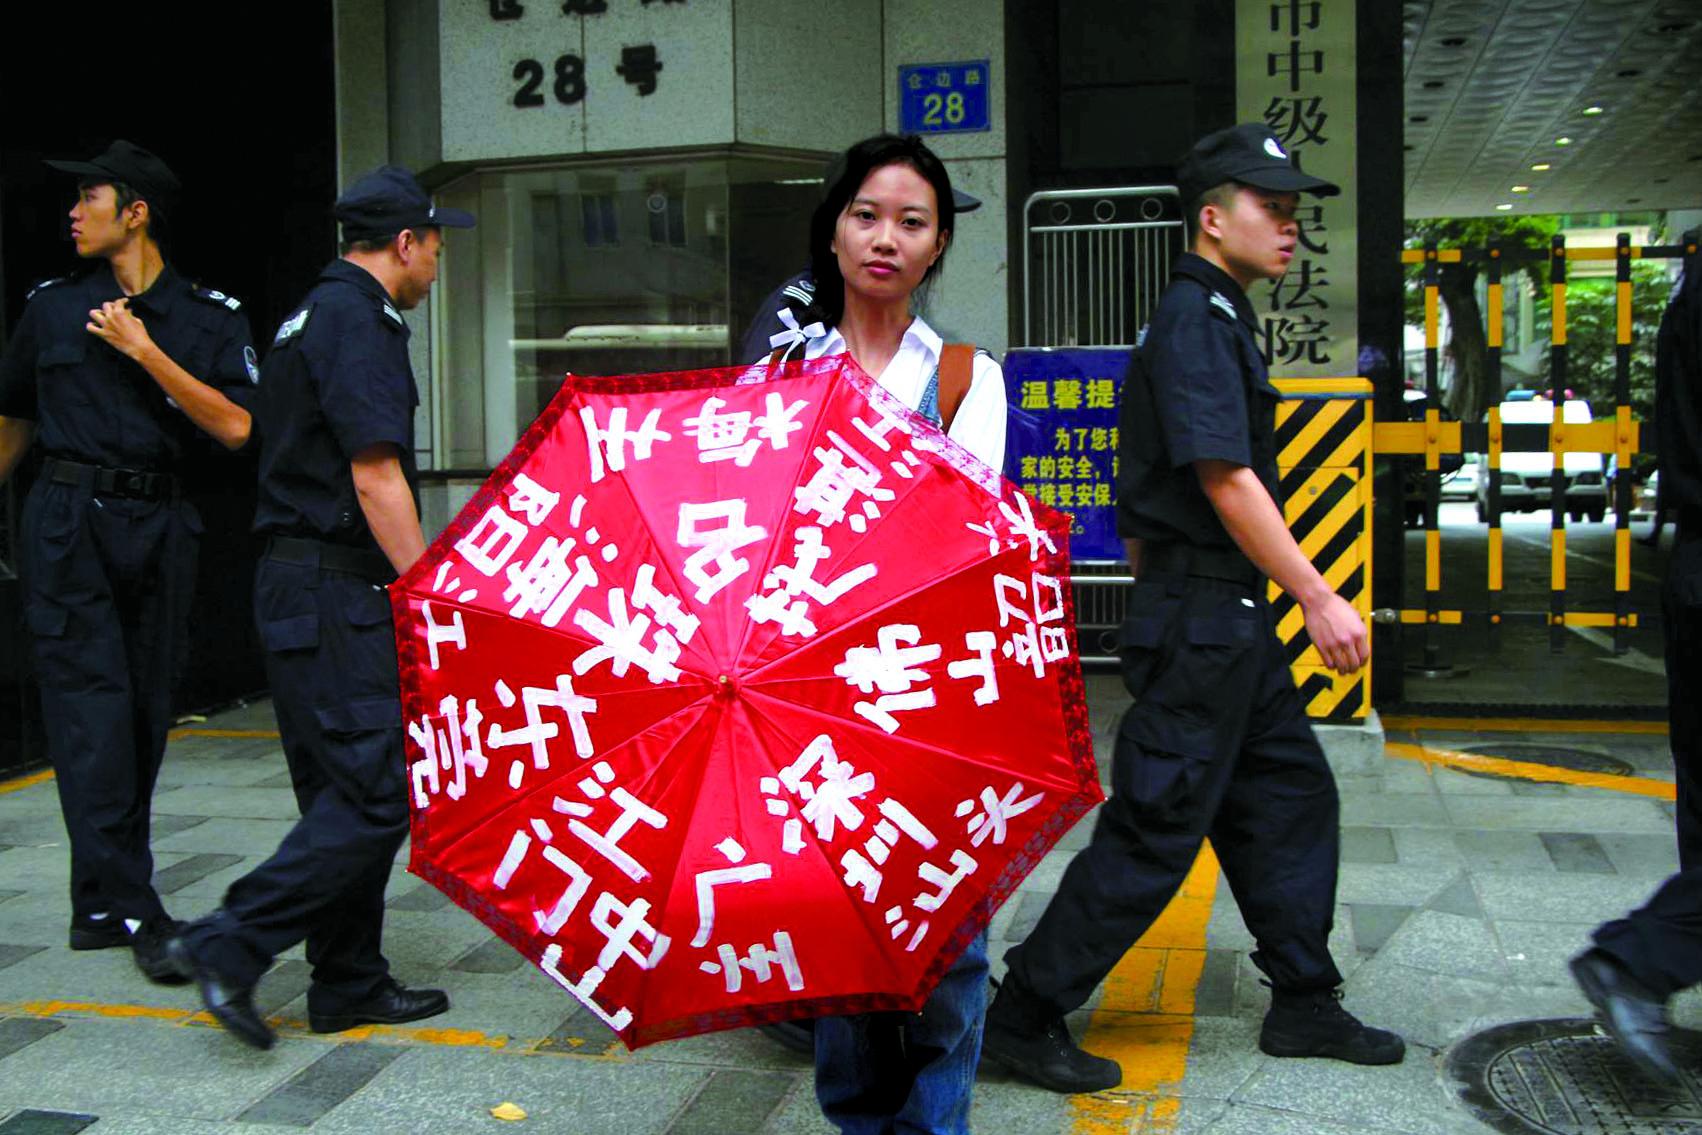 http://www.thestandard.com.hk/section-news/section/7/177334/The-activist-journalist